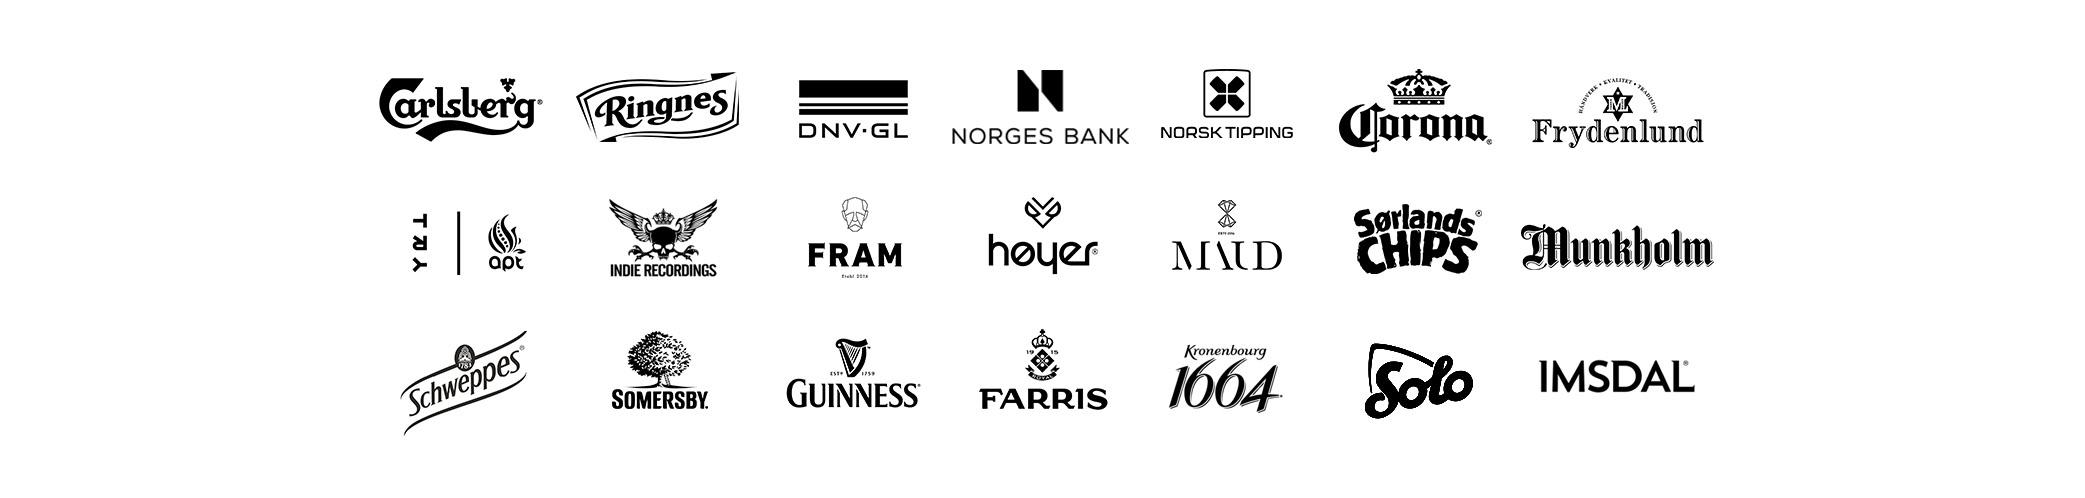 Commercial Logos 3_3.jpg